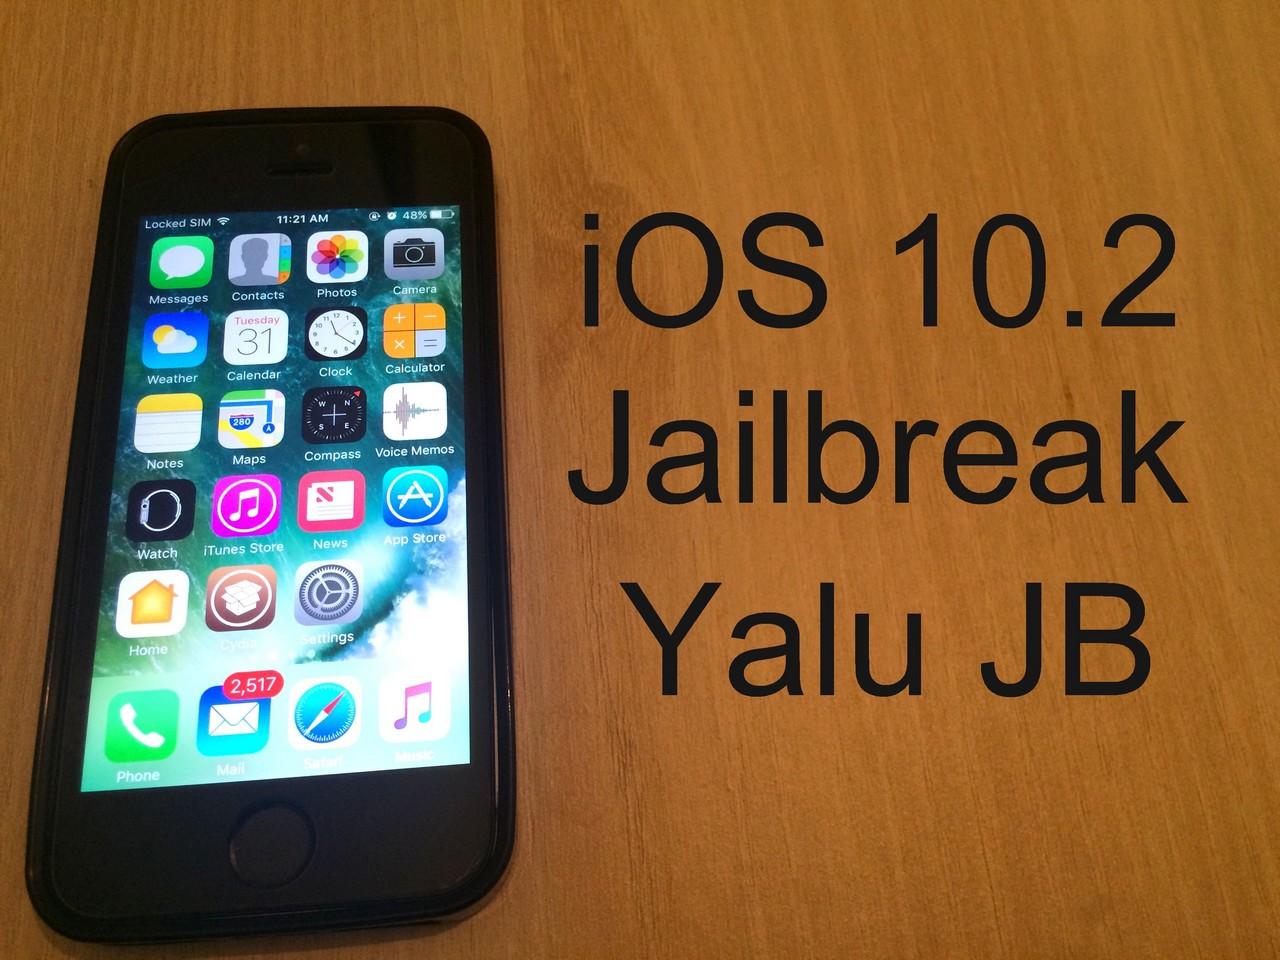 How to Jailbreak iOS 10 2 on iPhone or iPad Using Yalu Tool - iappTweak